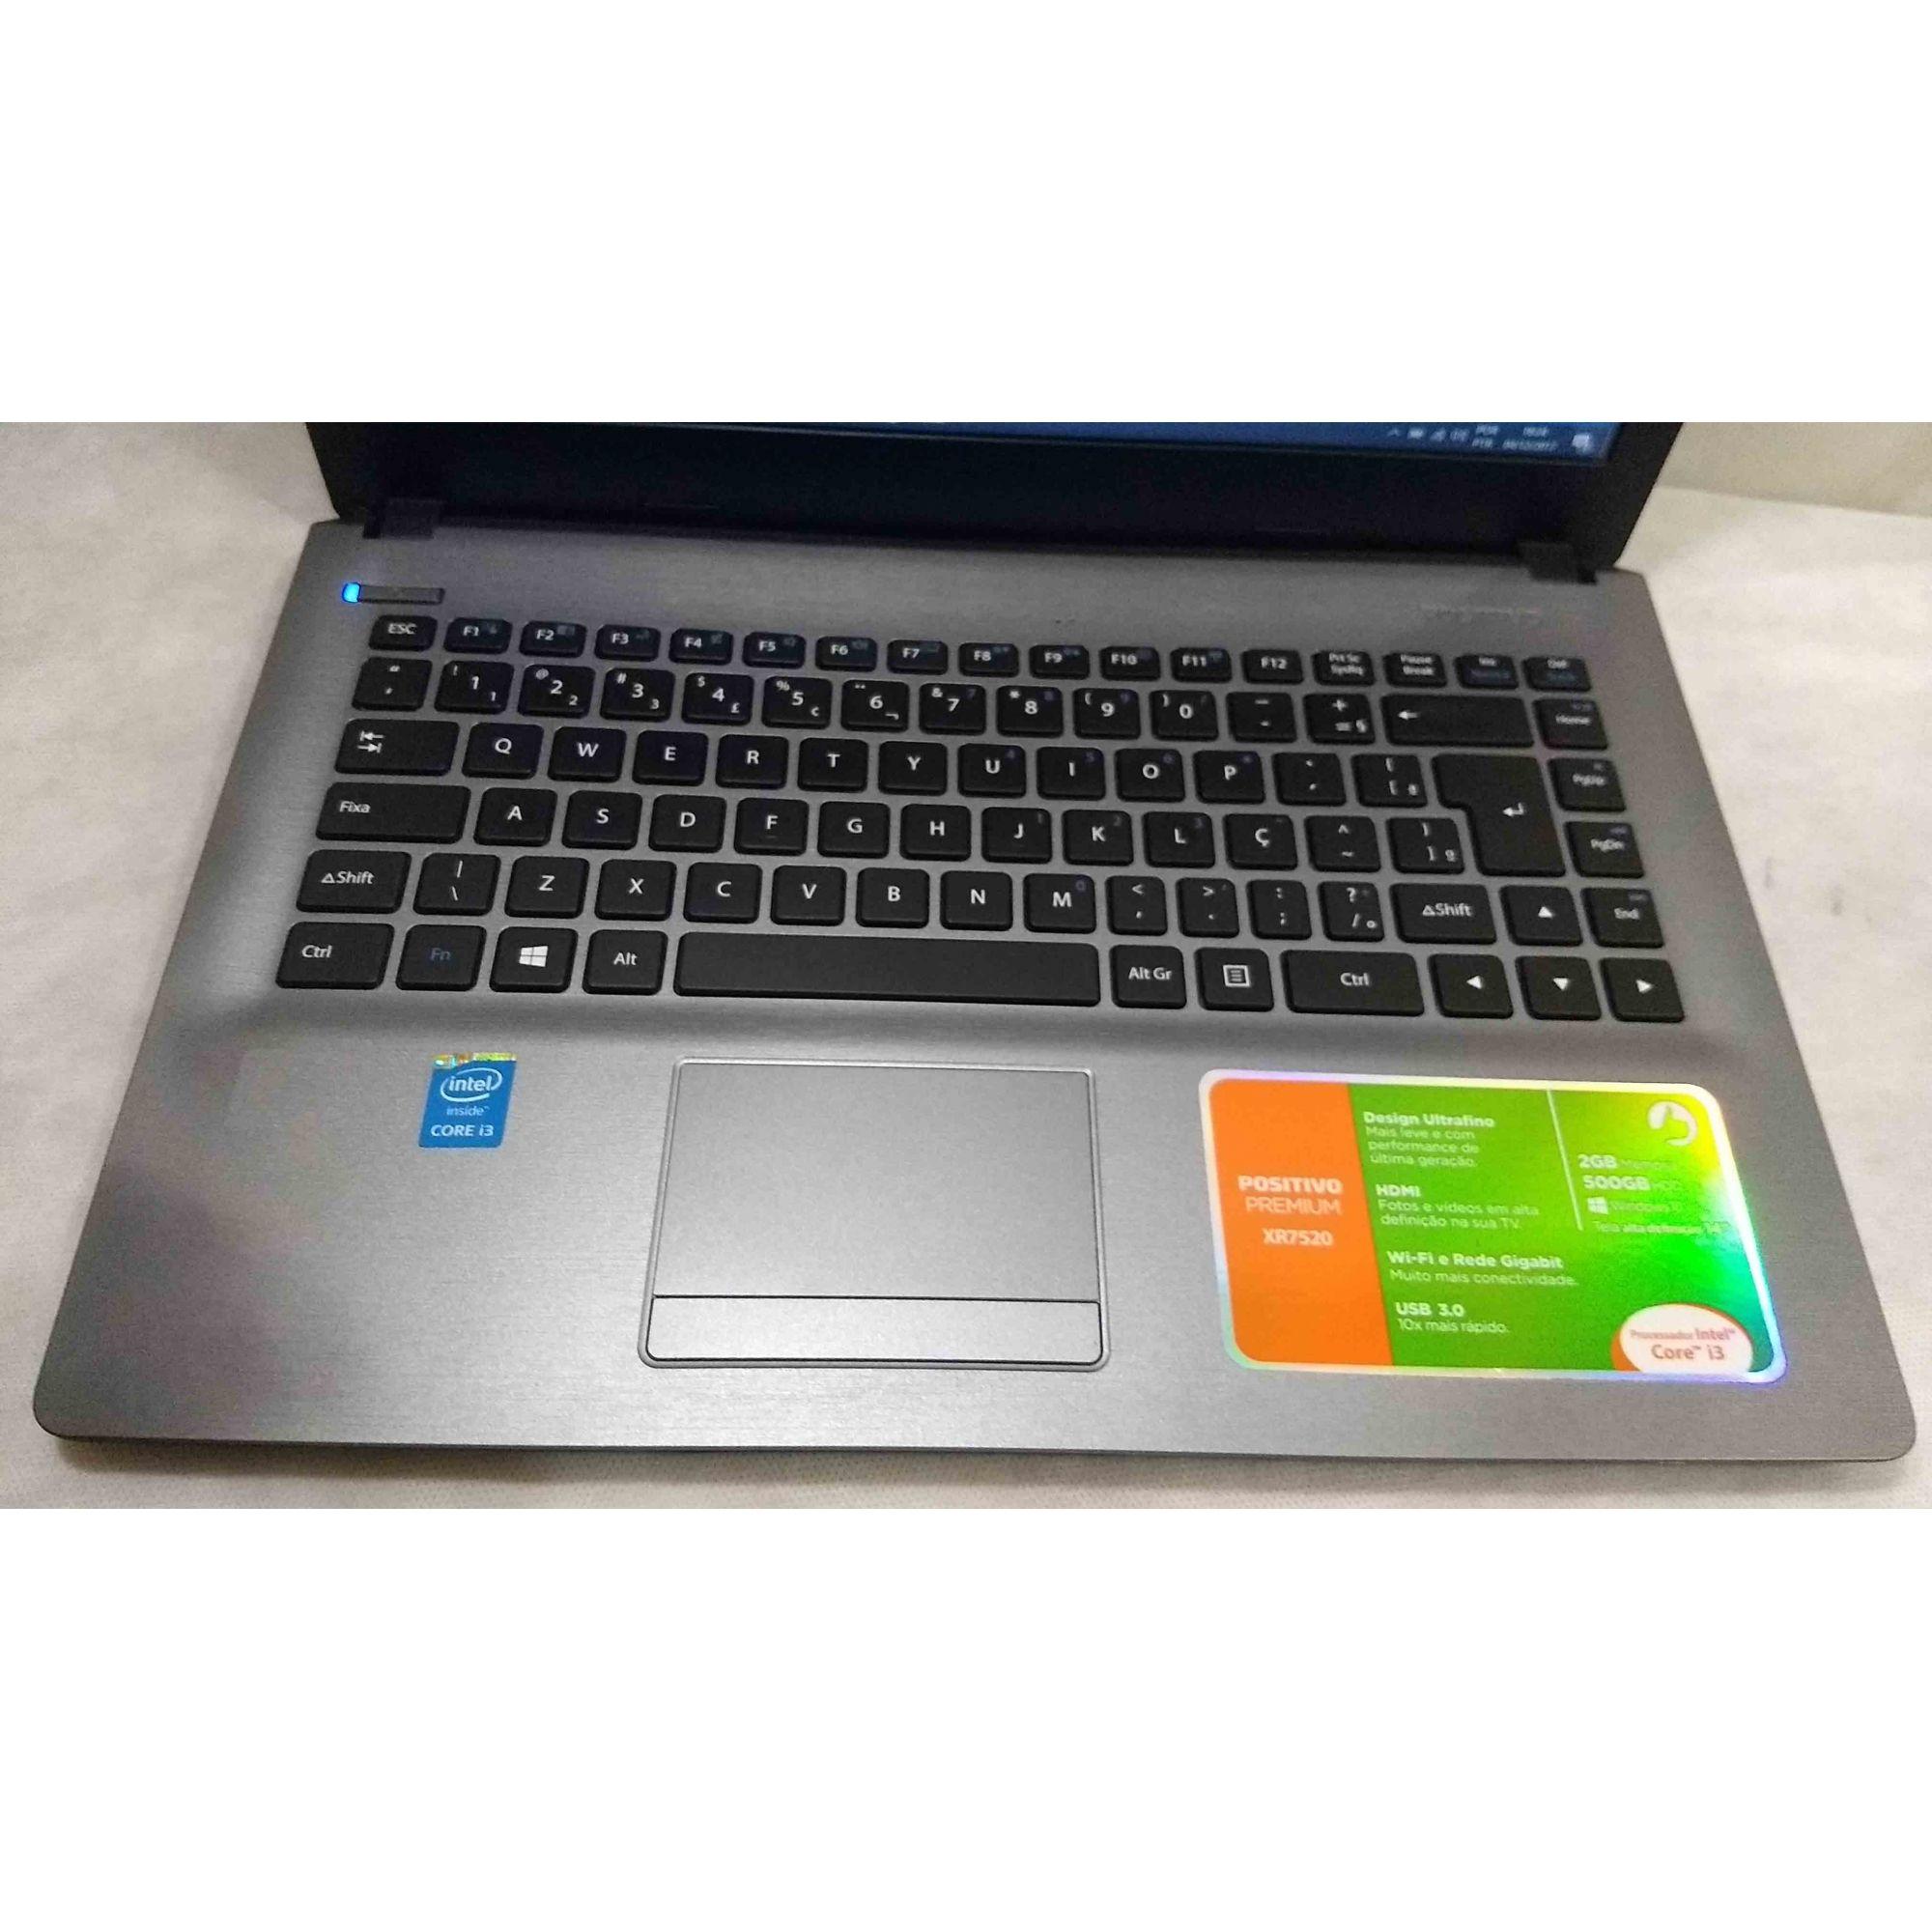 Notebook Positivo Premium XR7520 Core i3 1.7GHz 2GB HD-500GB